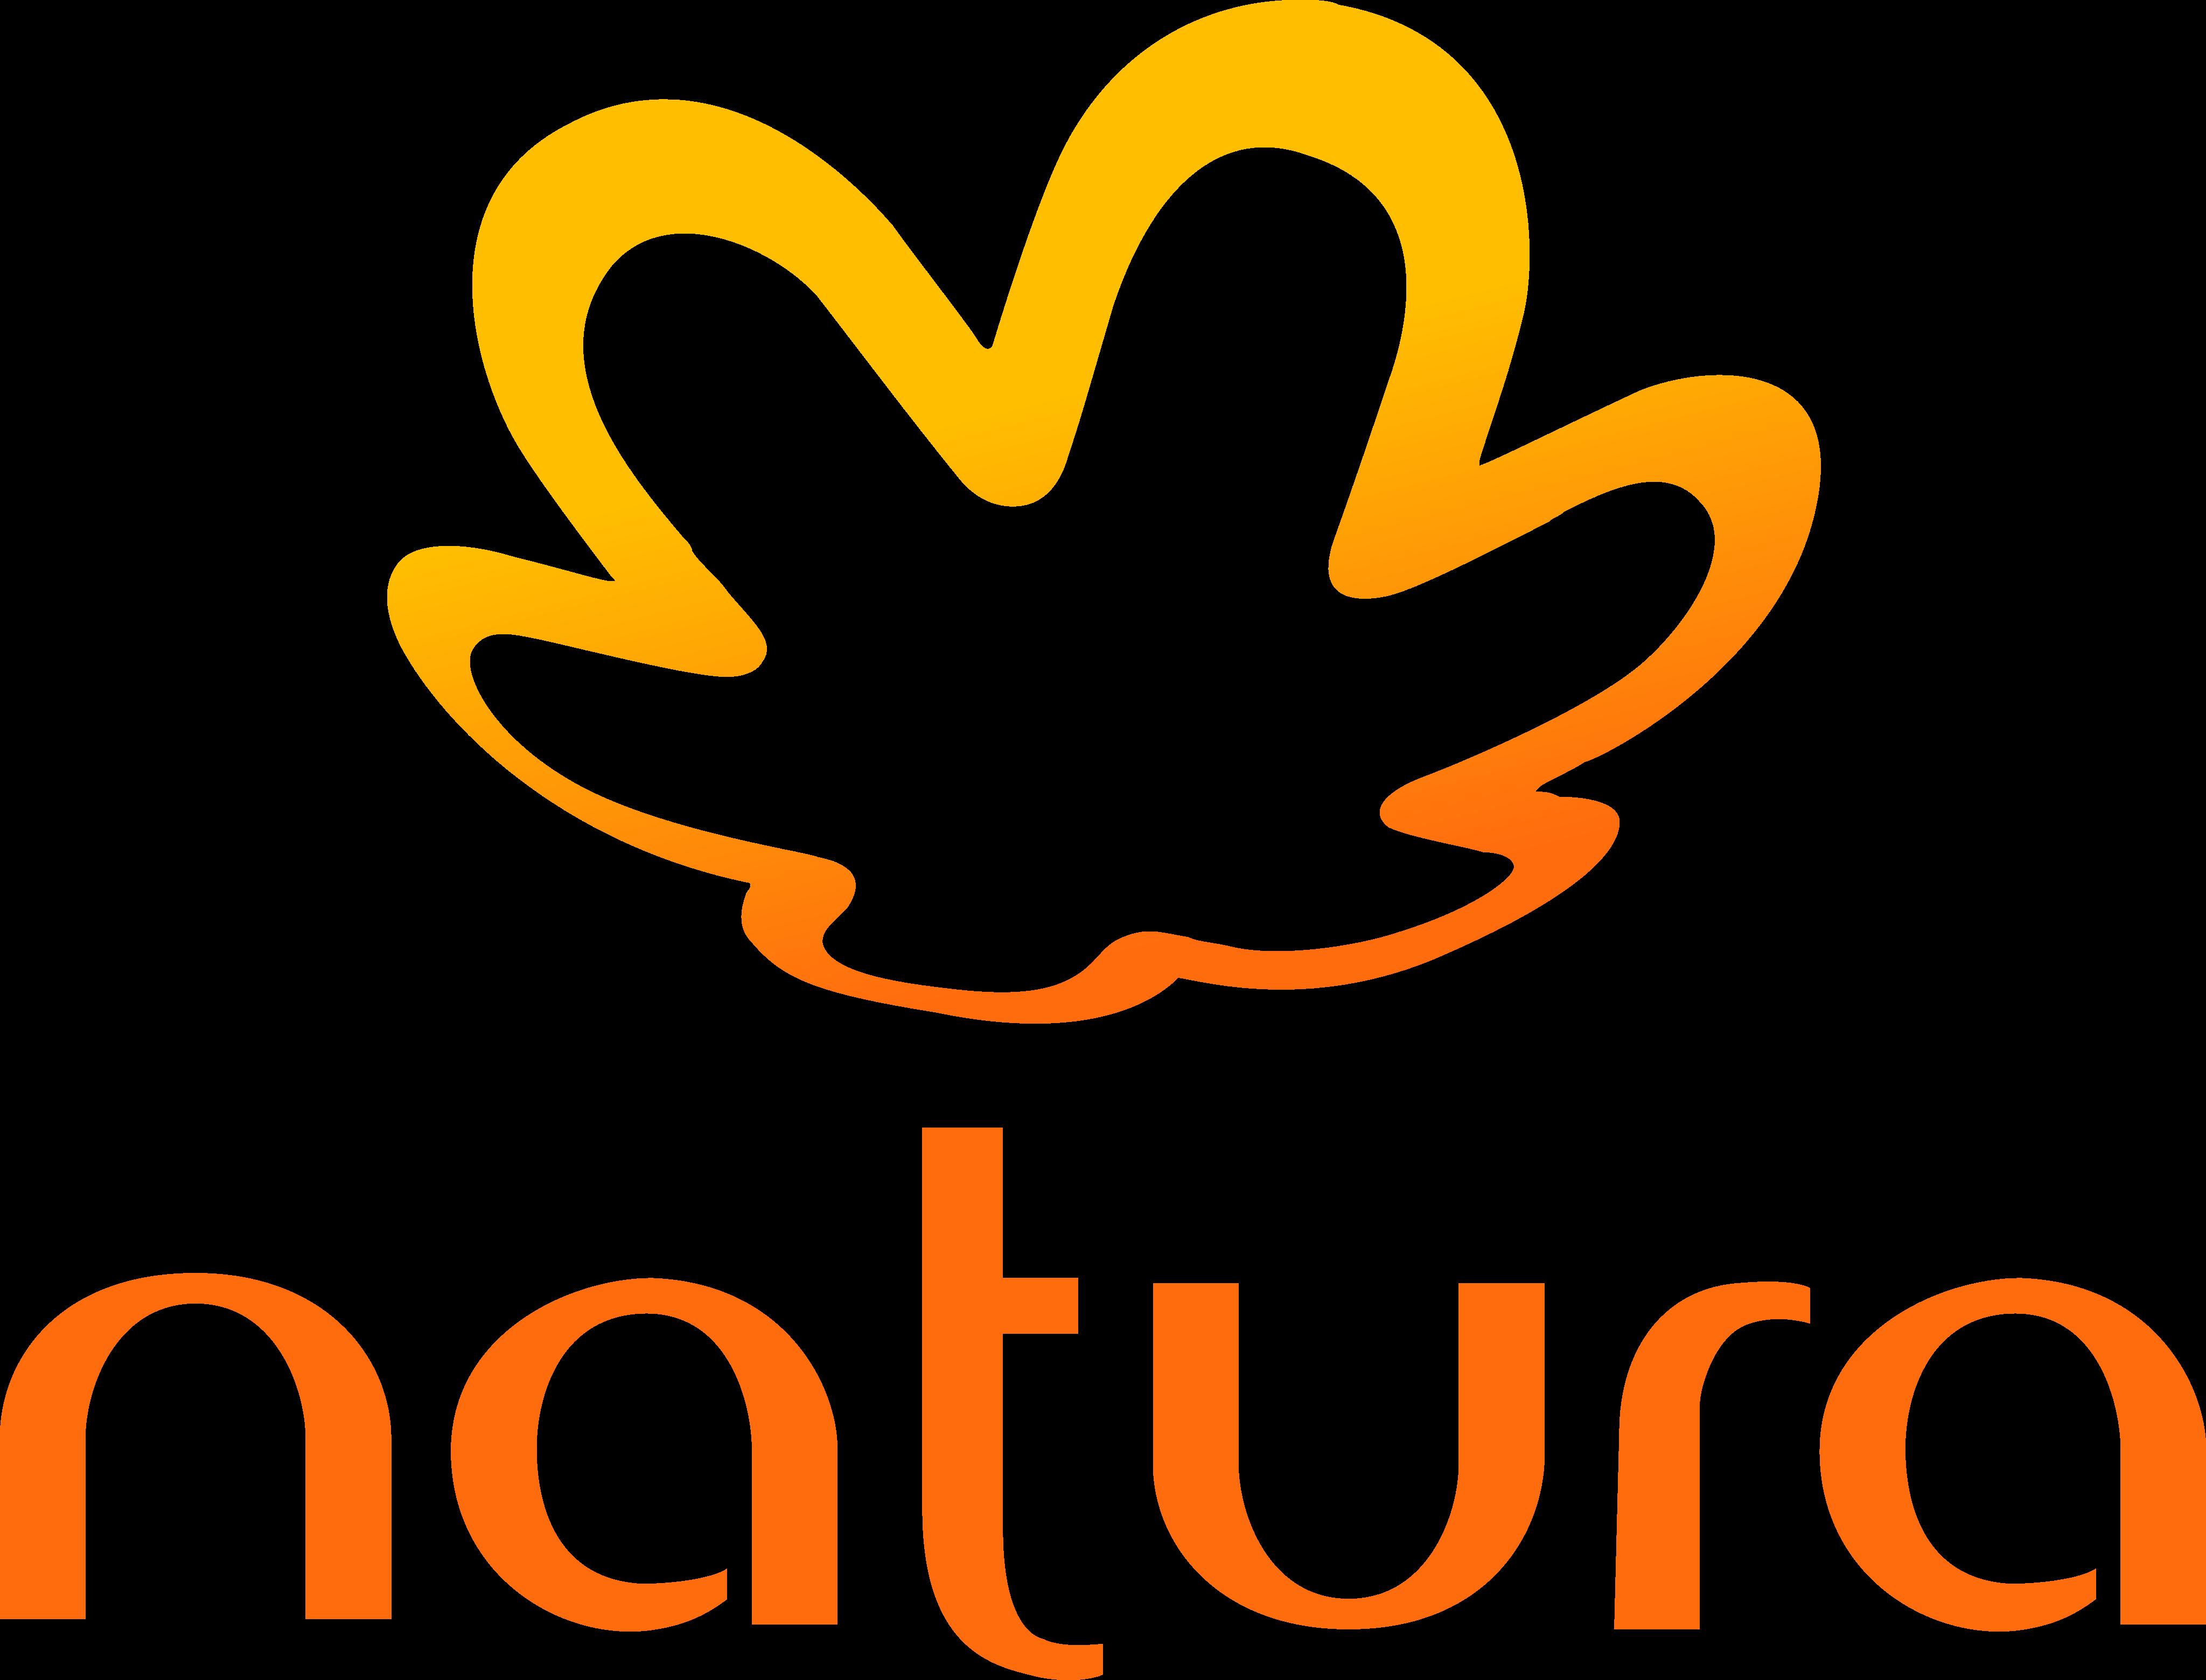 natura logo 16 - Natura Logo